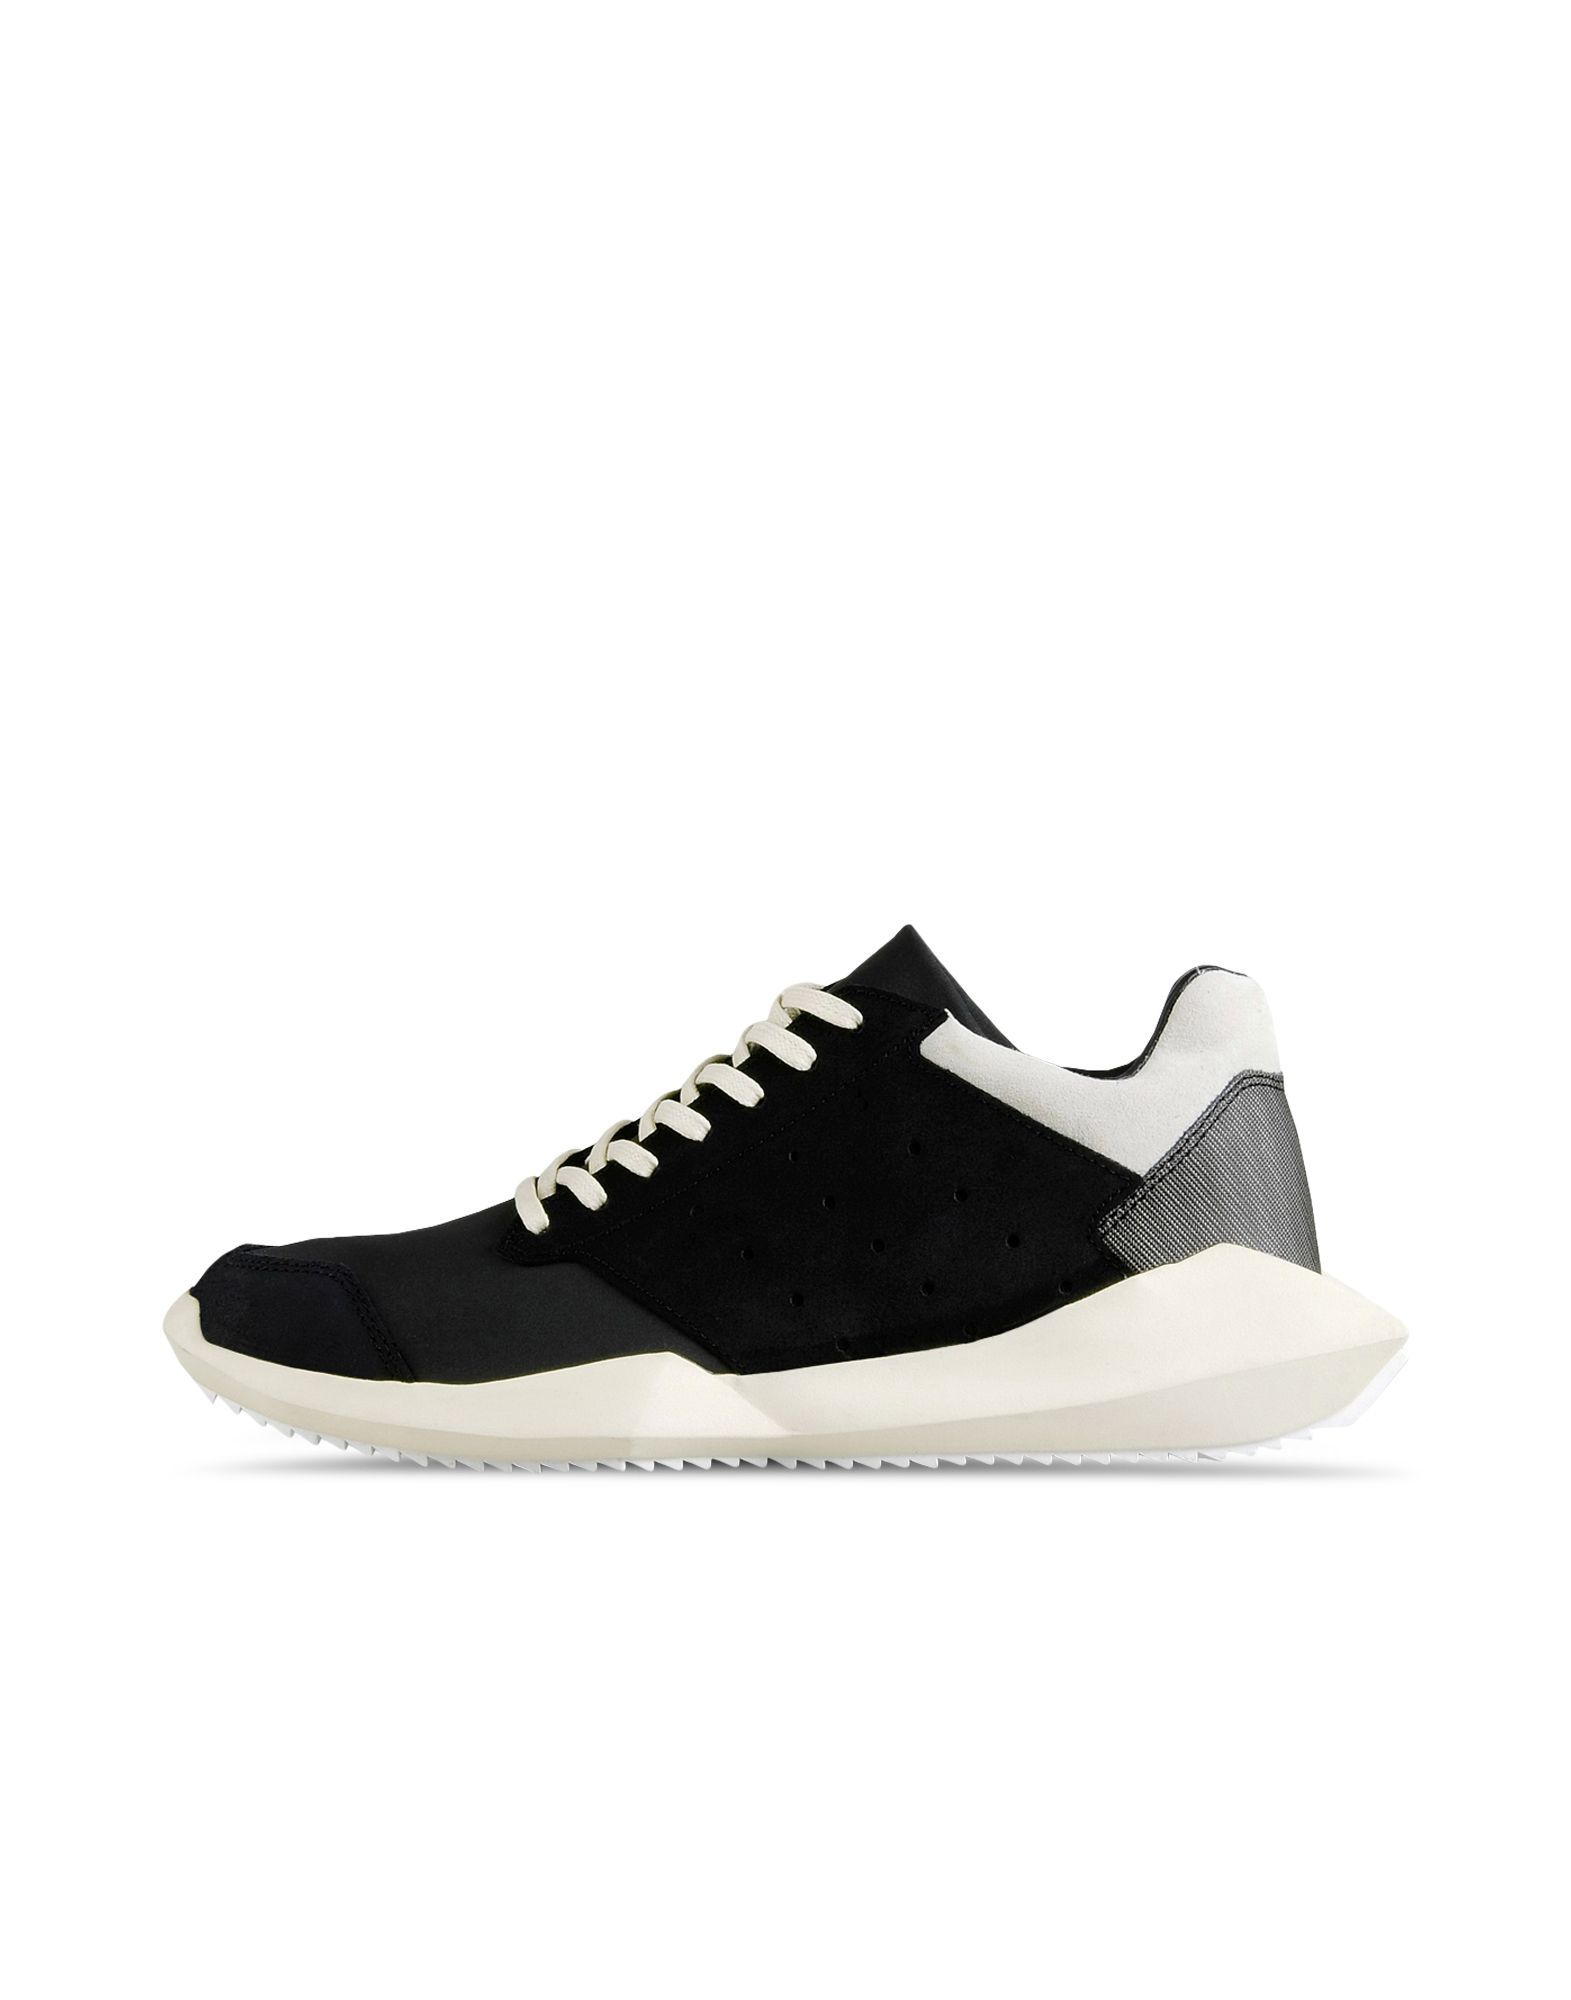 162a4dee Y-3 Online Store -, Rick Owens Tech Runner   Wear   Uñas pies ...